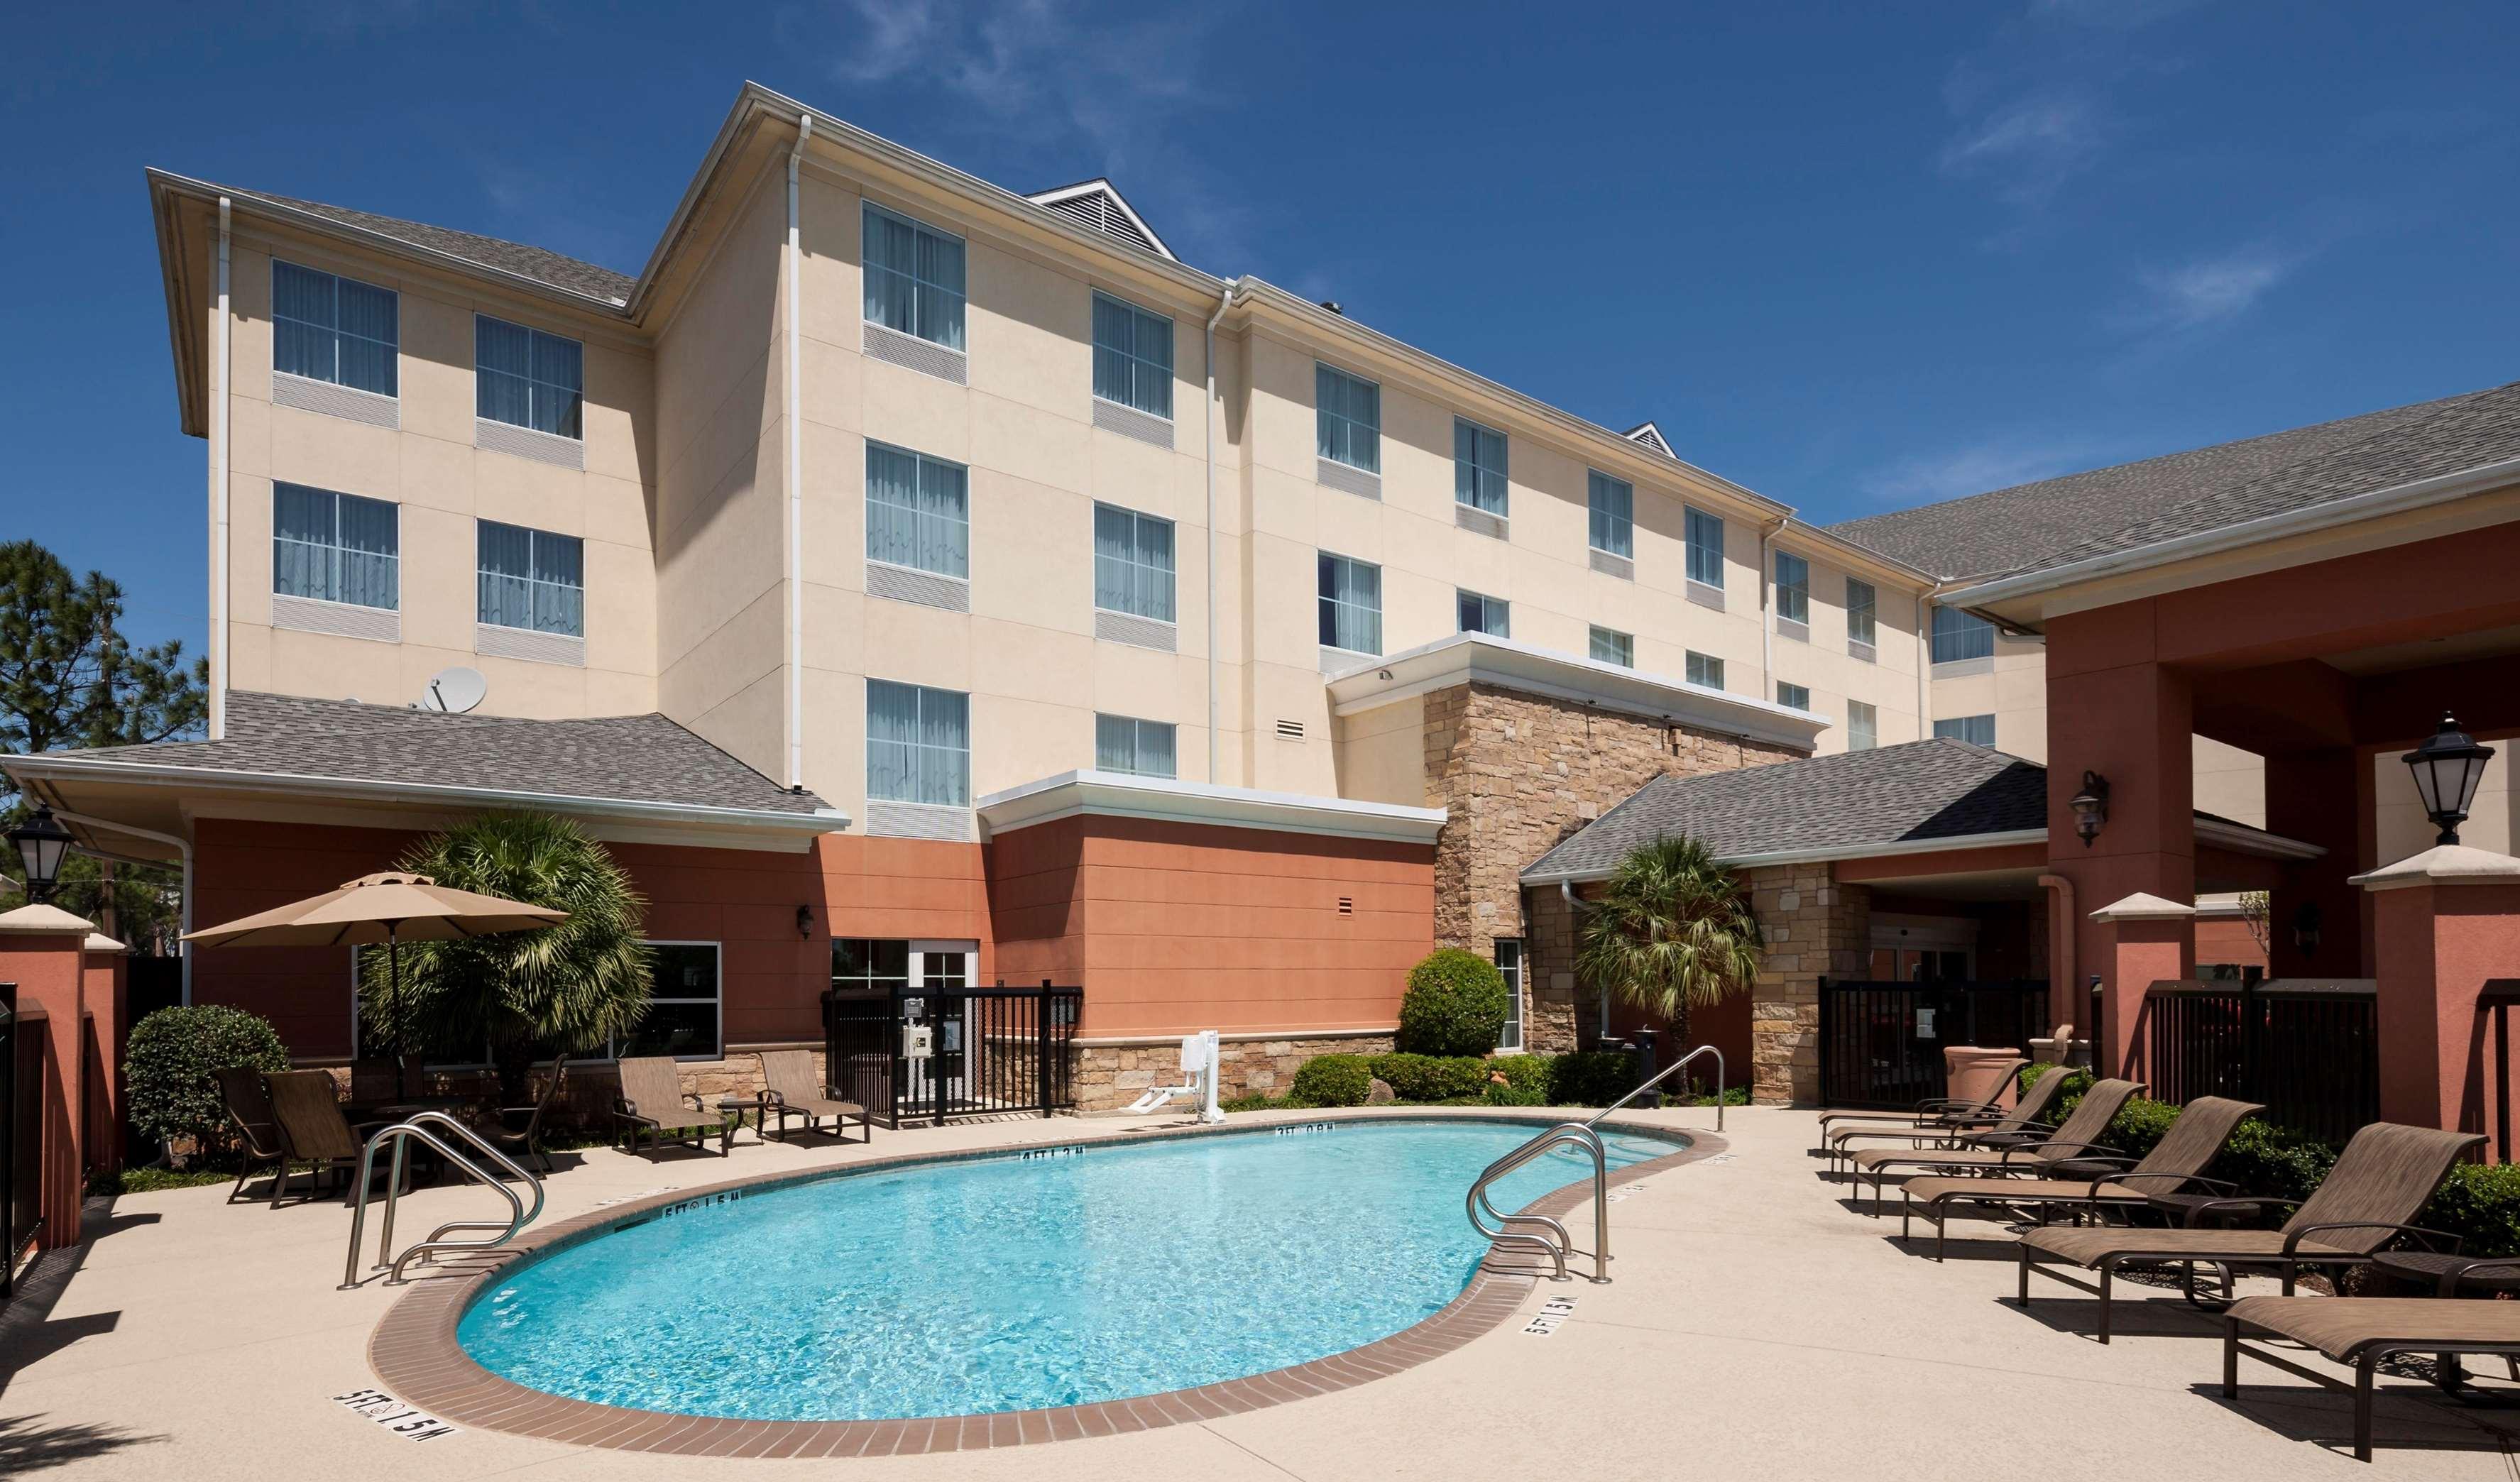 Hotels In Sugar Land Houston Tx